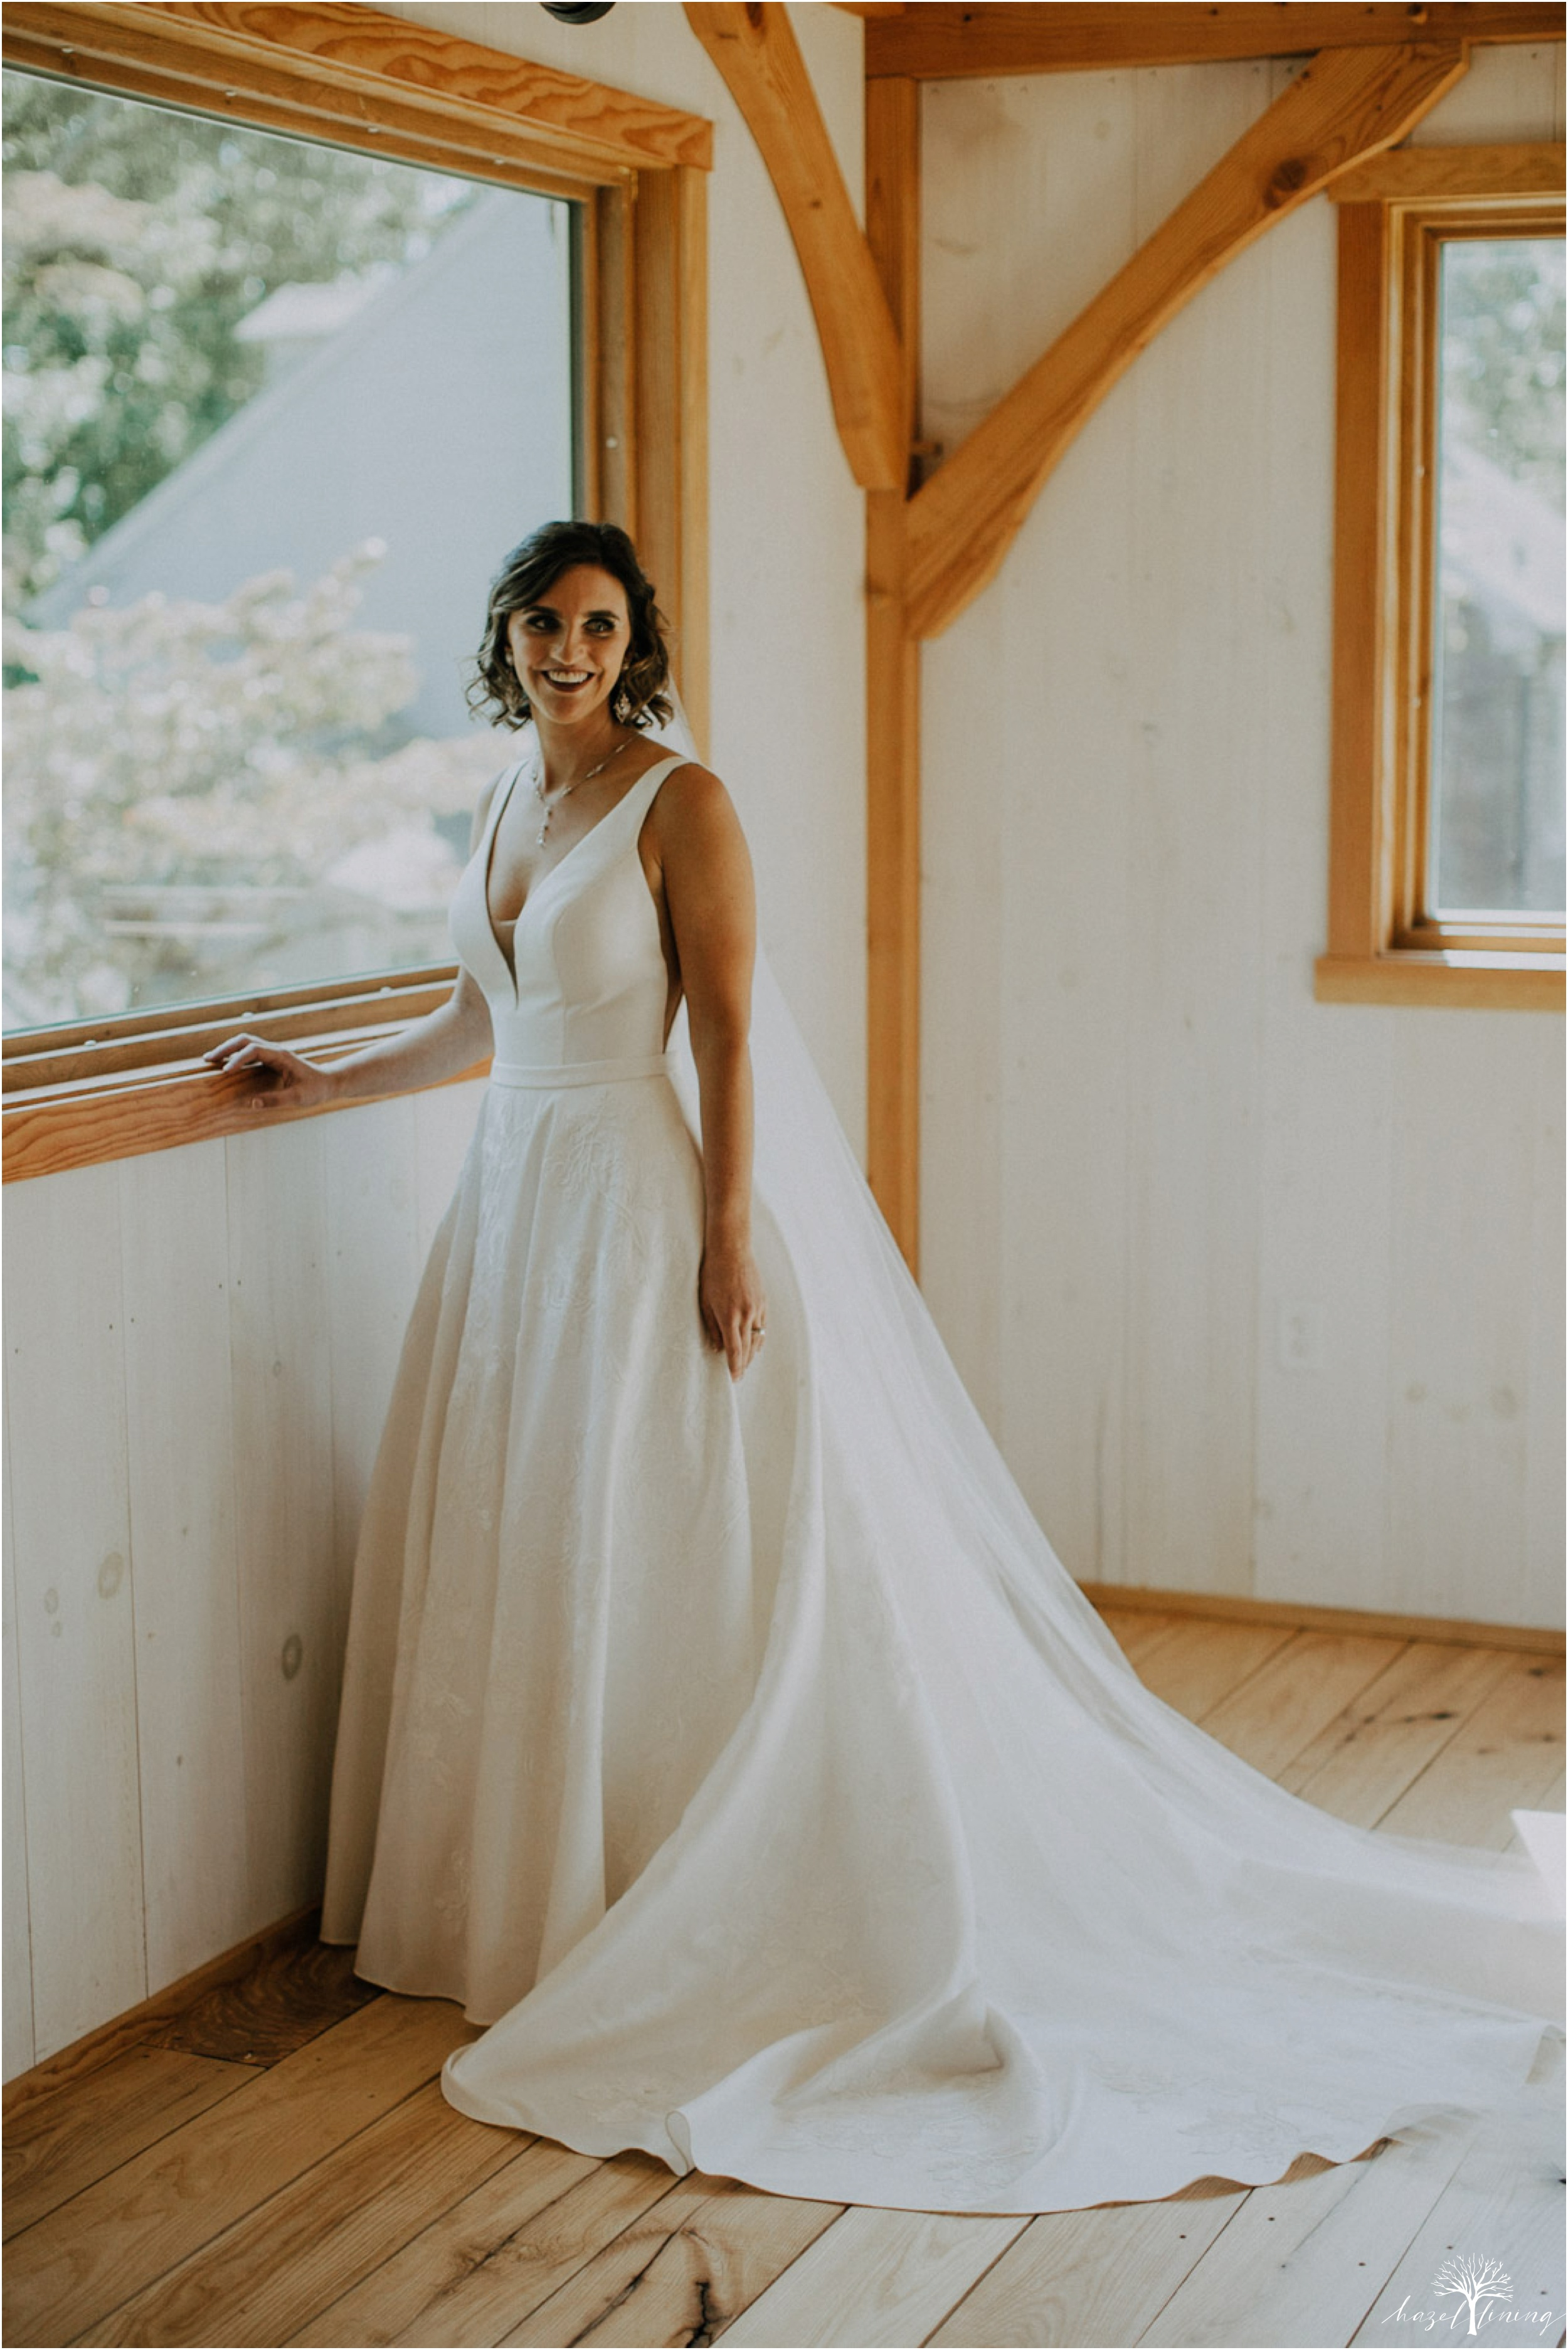 maureen-hepner-anthony-giordano-rose-bank-winery-newtow-pennsylvania-luxury-summer-wedding-hazel-lining-photography-destination-elopement-wedding-engagement-photography_0024.jpg